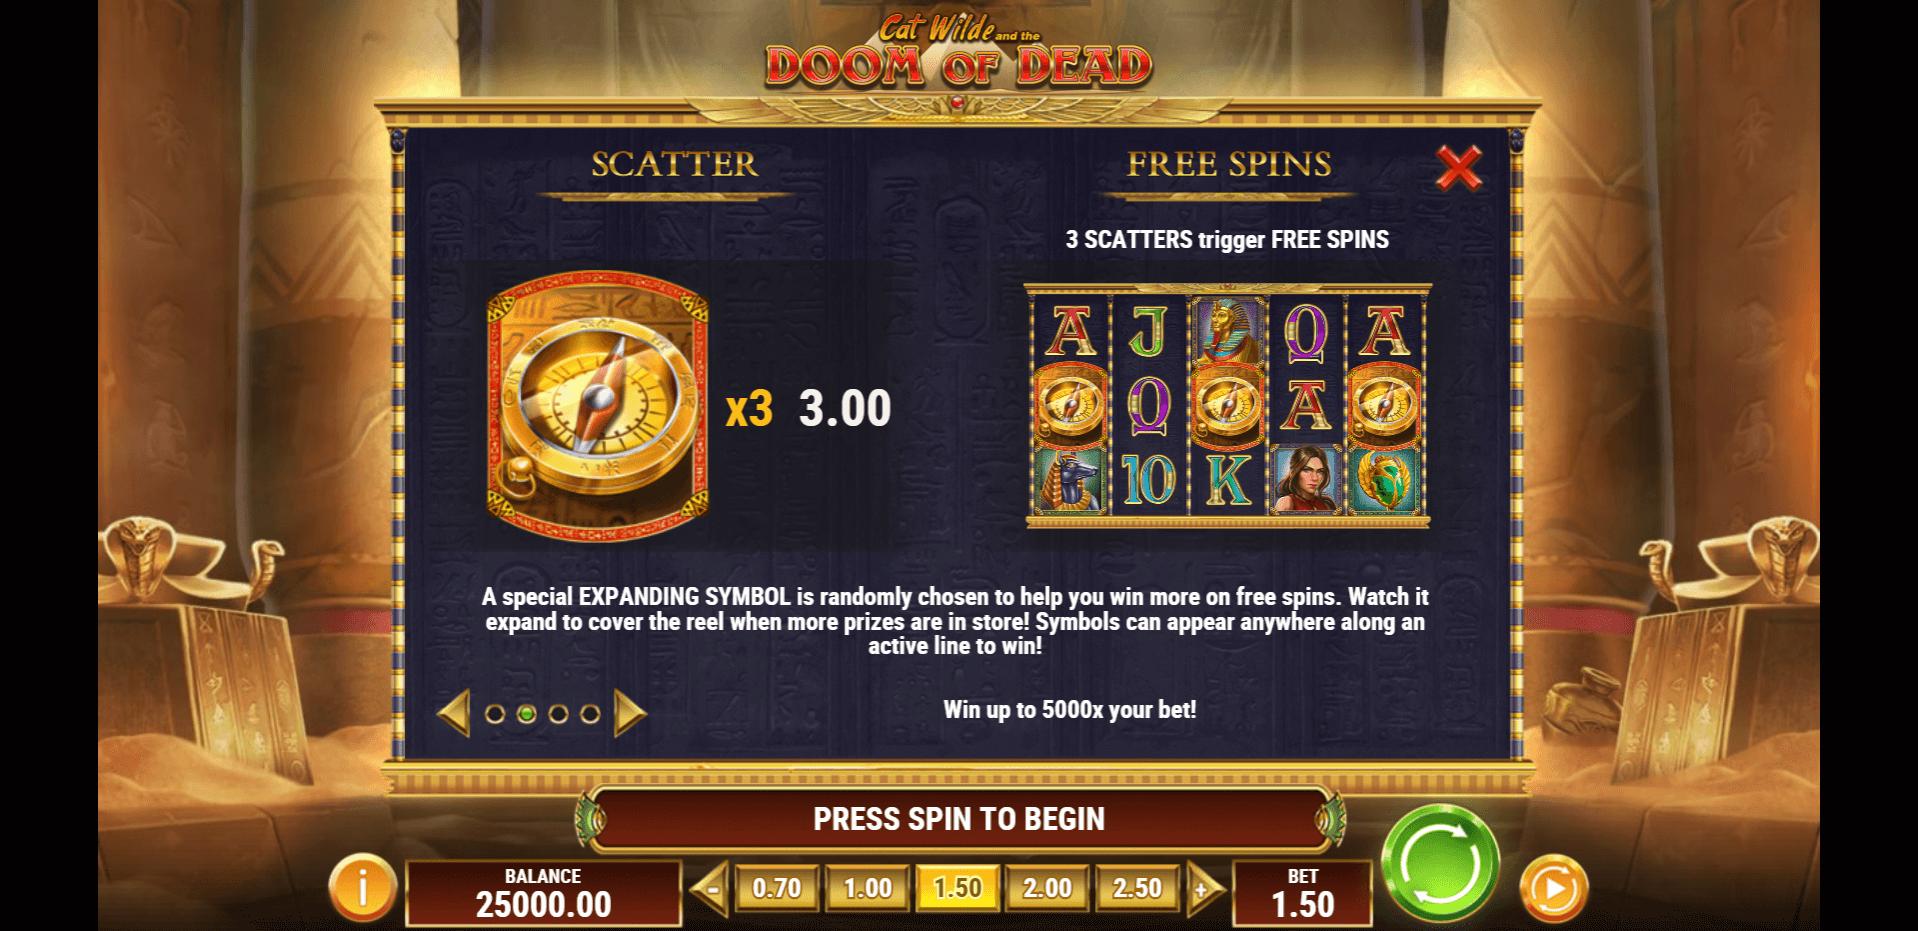 Cat Wilde and the Doom of Dead Slot Machine